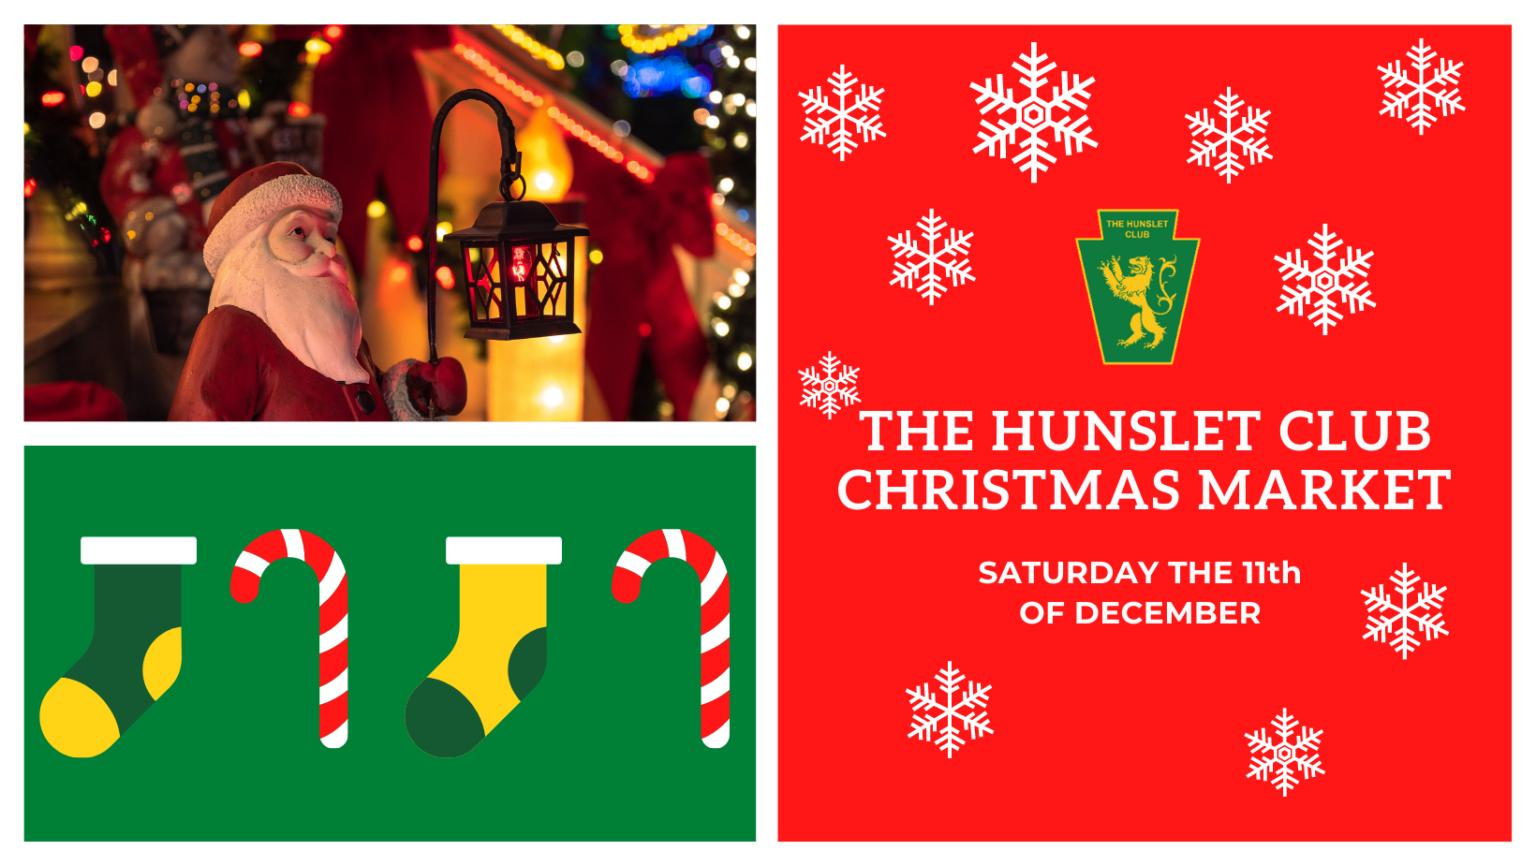 The Hunslet Club Christmas Markets